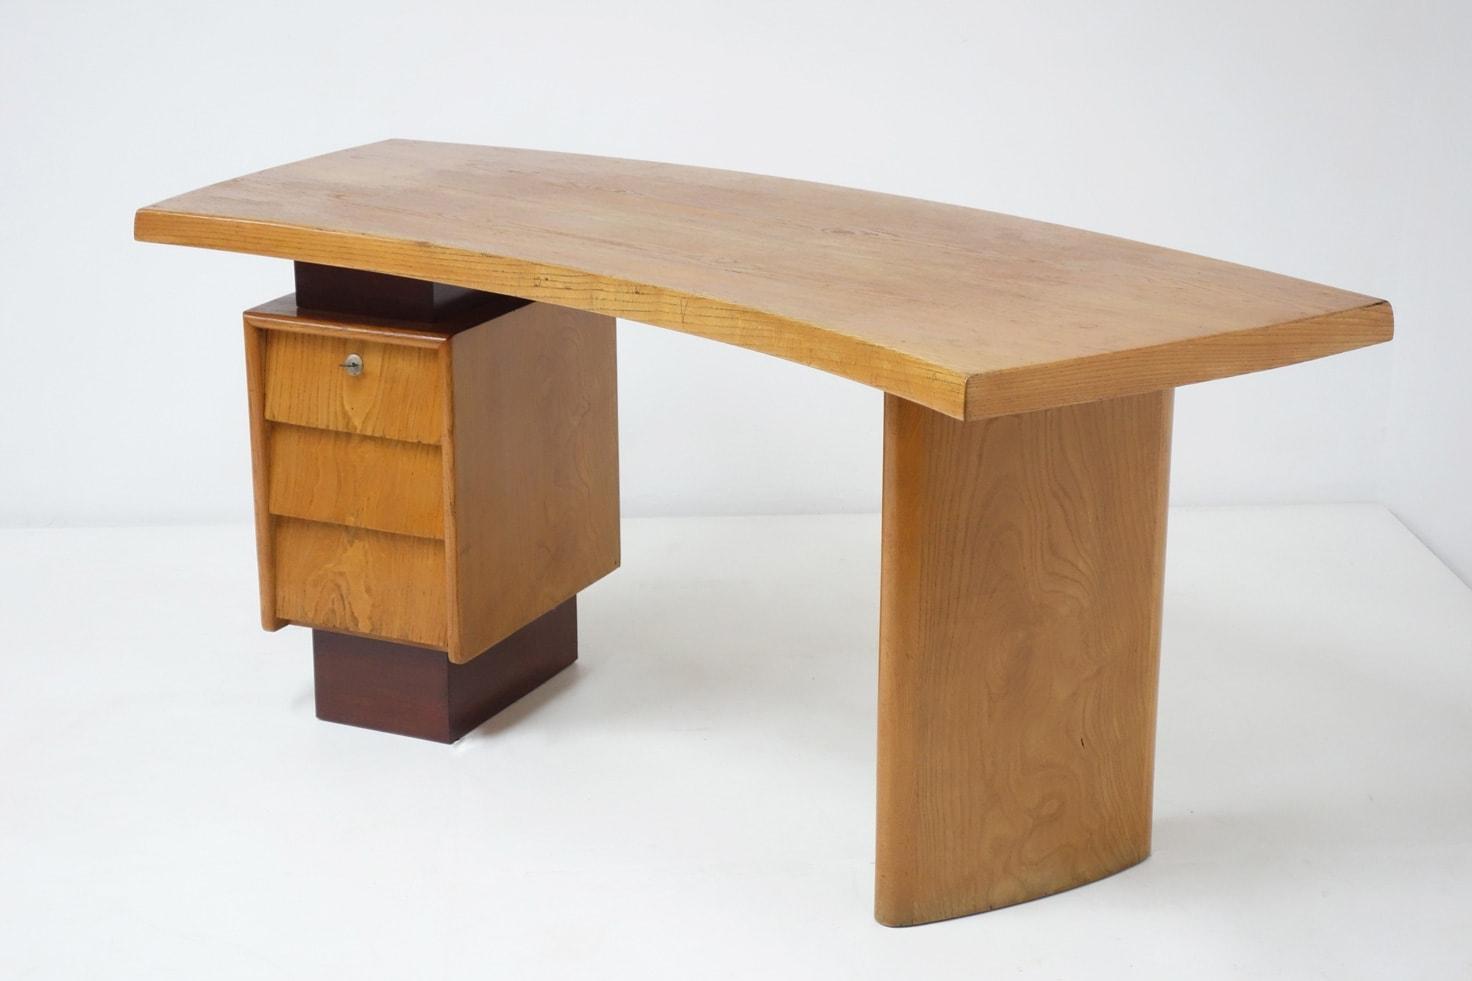 Charlotte Perriand & Pierre Jeanneret, Desk N°9, vue 01